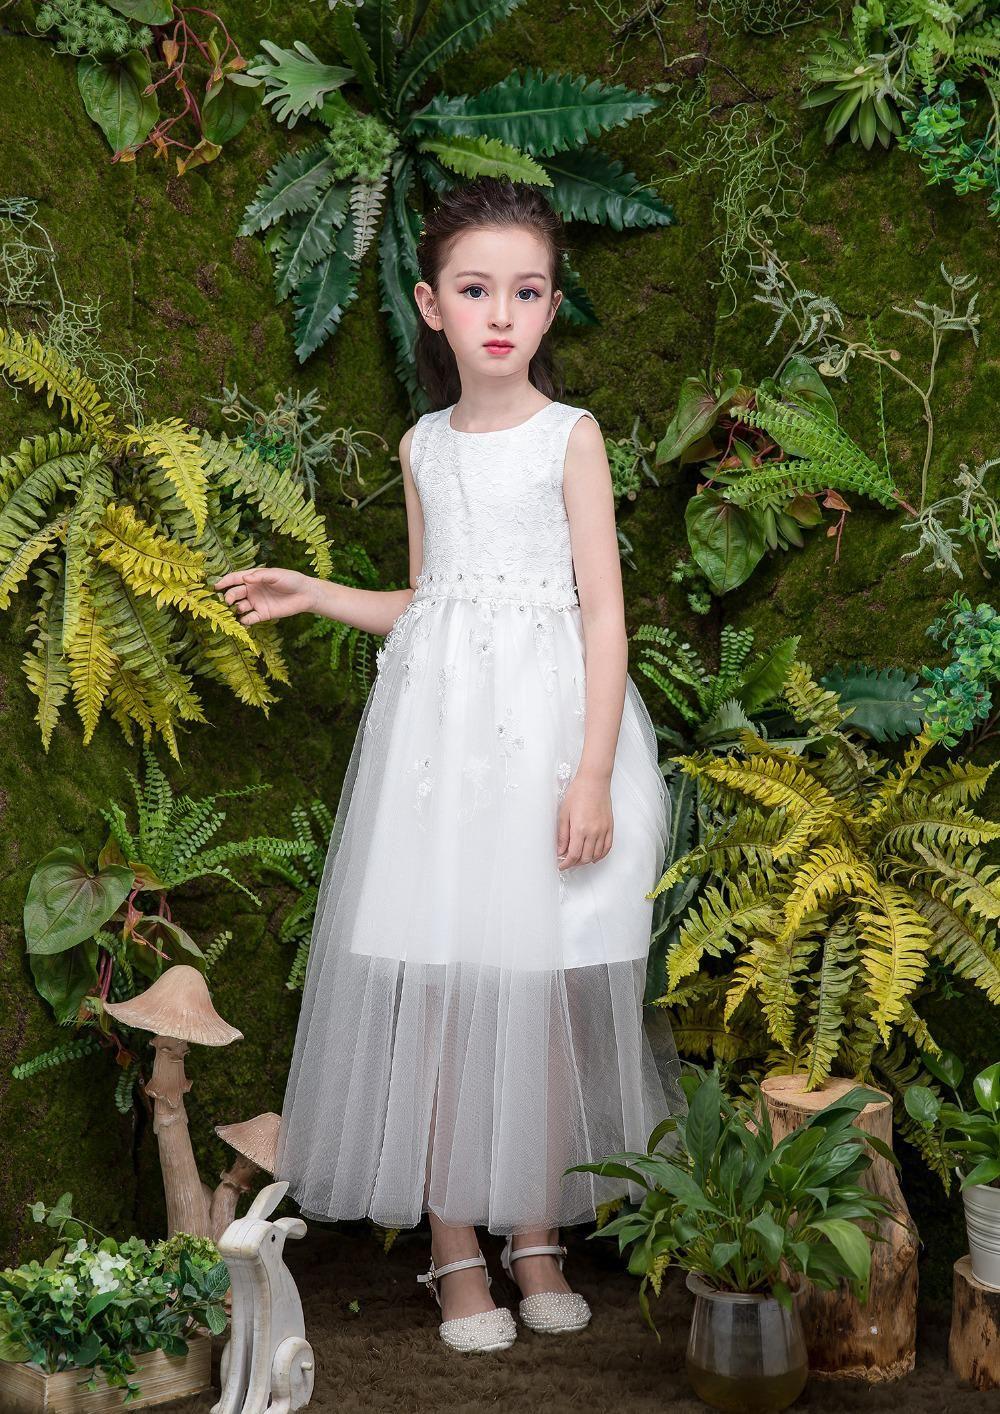 Girls long dress fashion trend casual dress for girl tunic lace